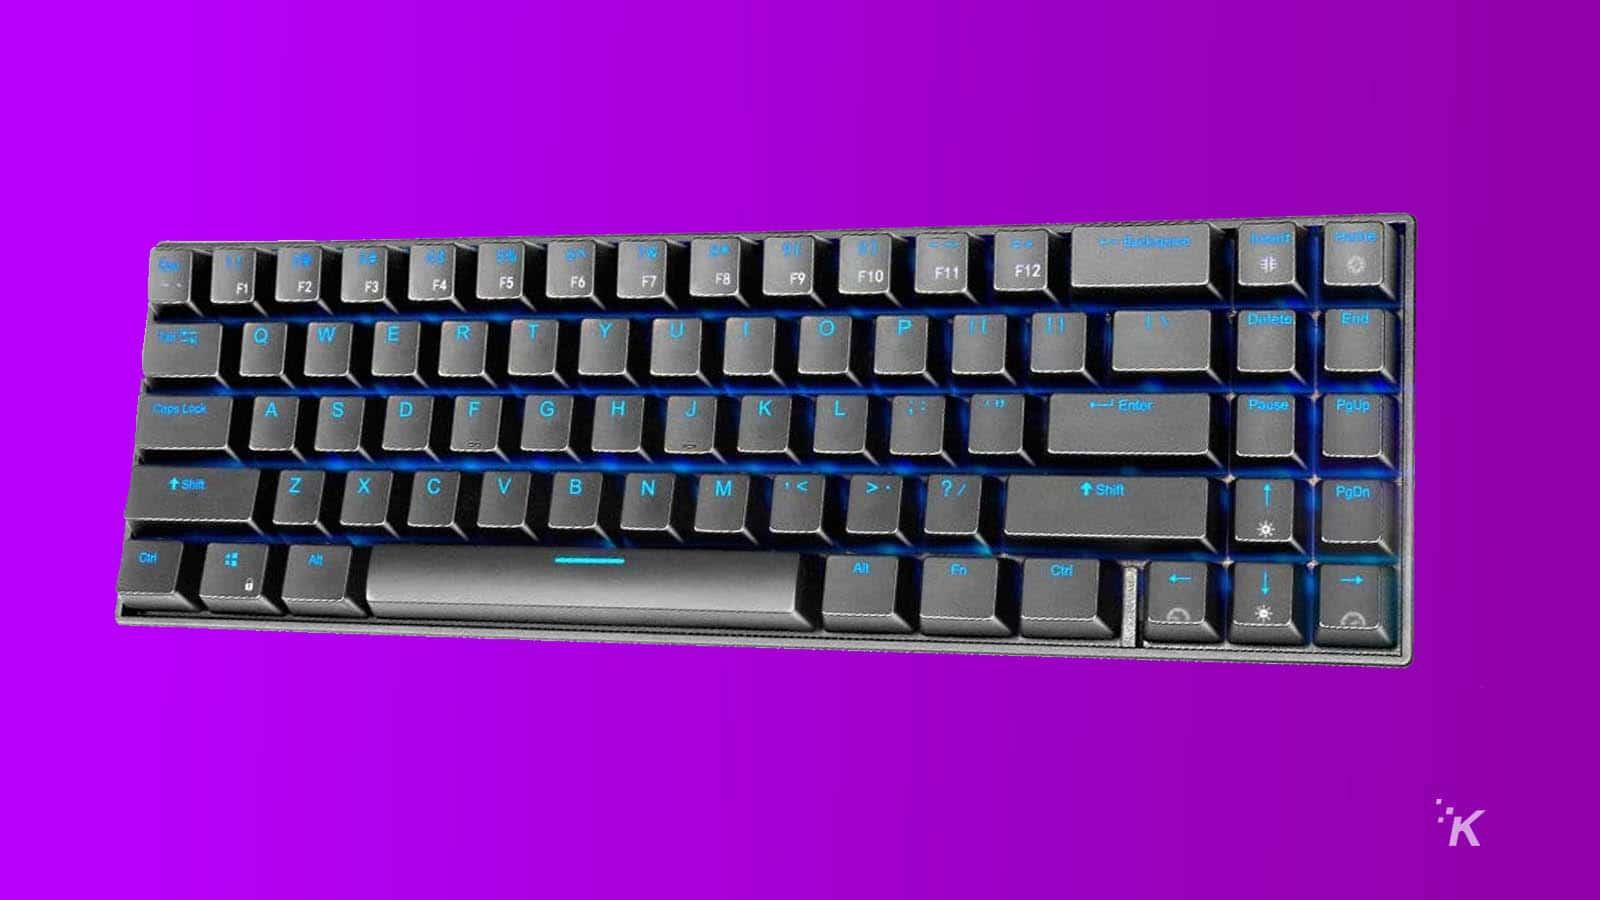 velocifire wireless keyboard